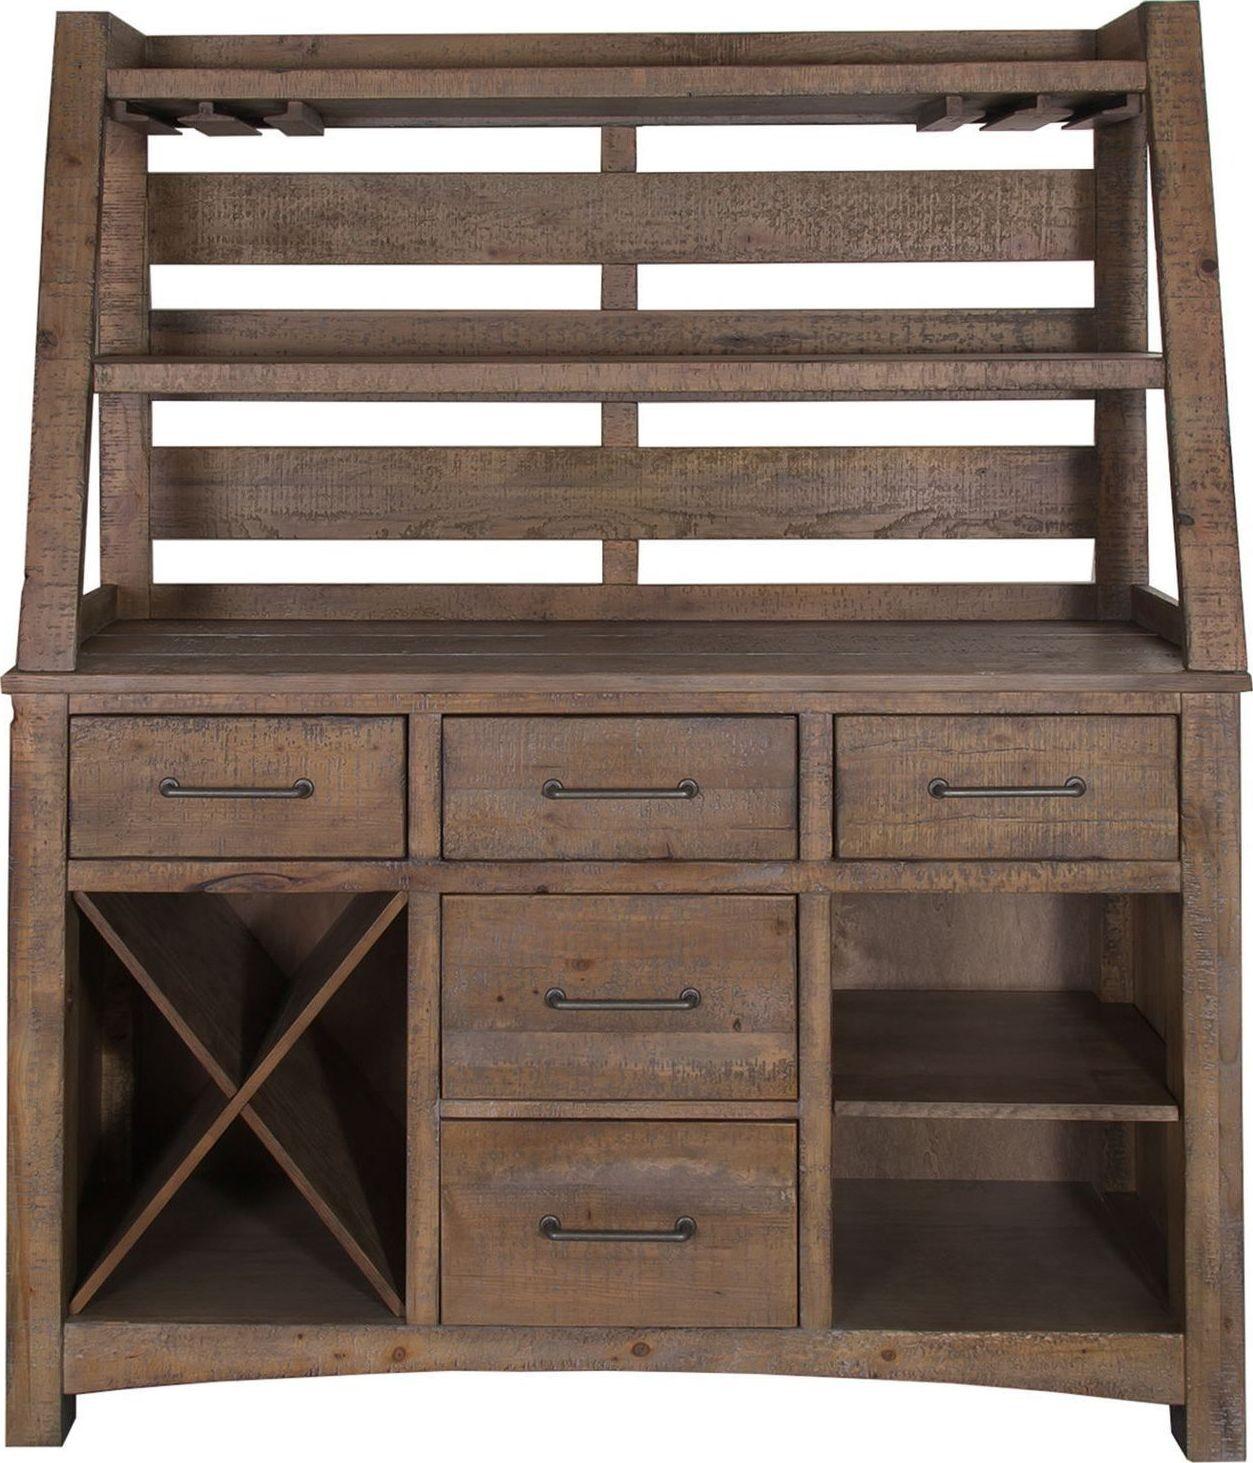 Prescott Antique Honey Server With Hutch From Liberty (178 SR5868 SH5868)    Coleman Furniture